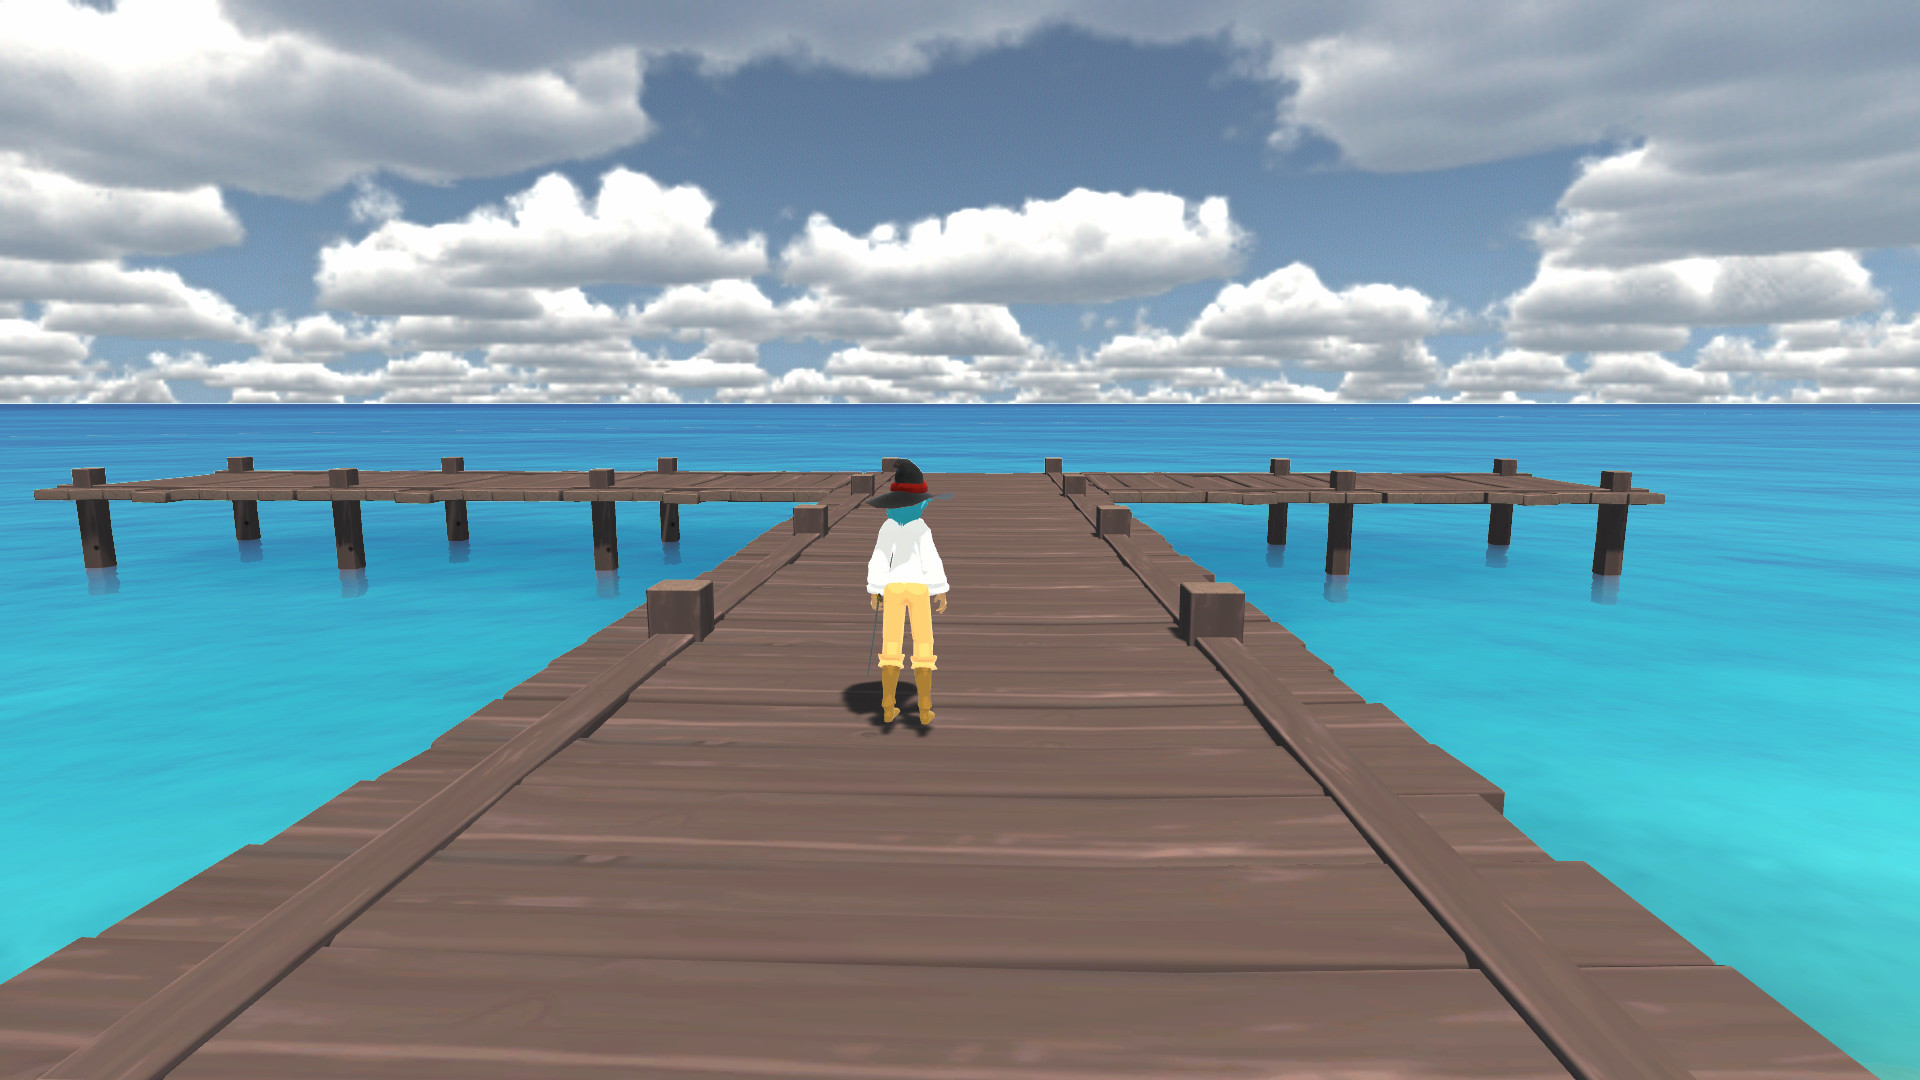 A rather serene dock.